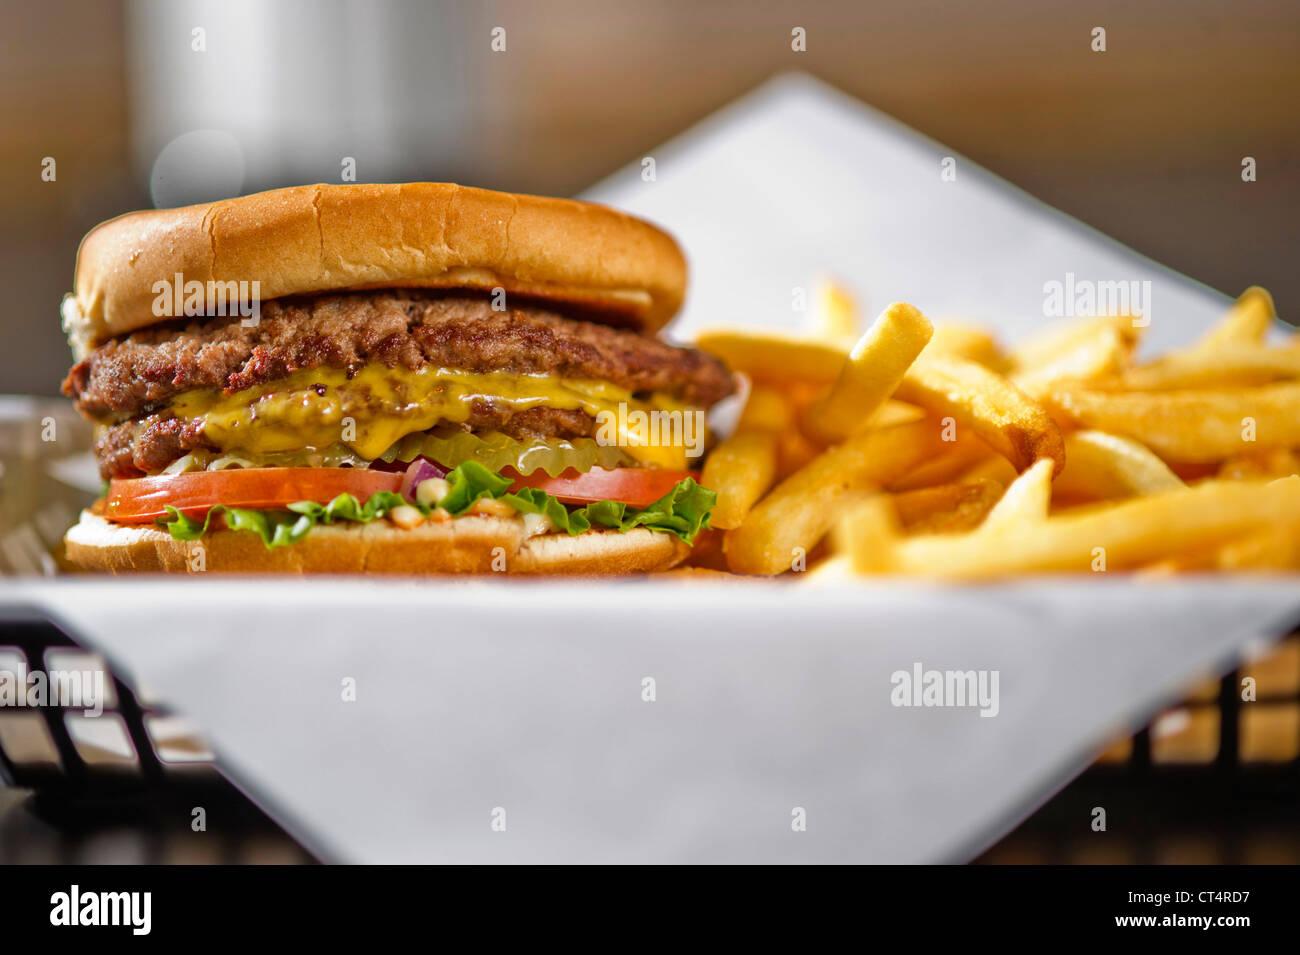 Einen Cheeseburger in einem Korb mit Pommes frites. Stockbild